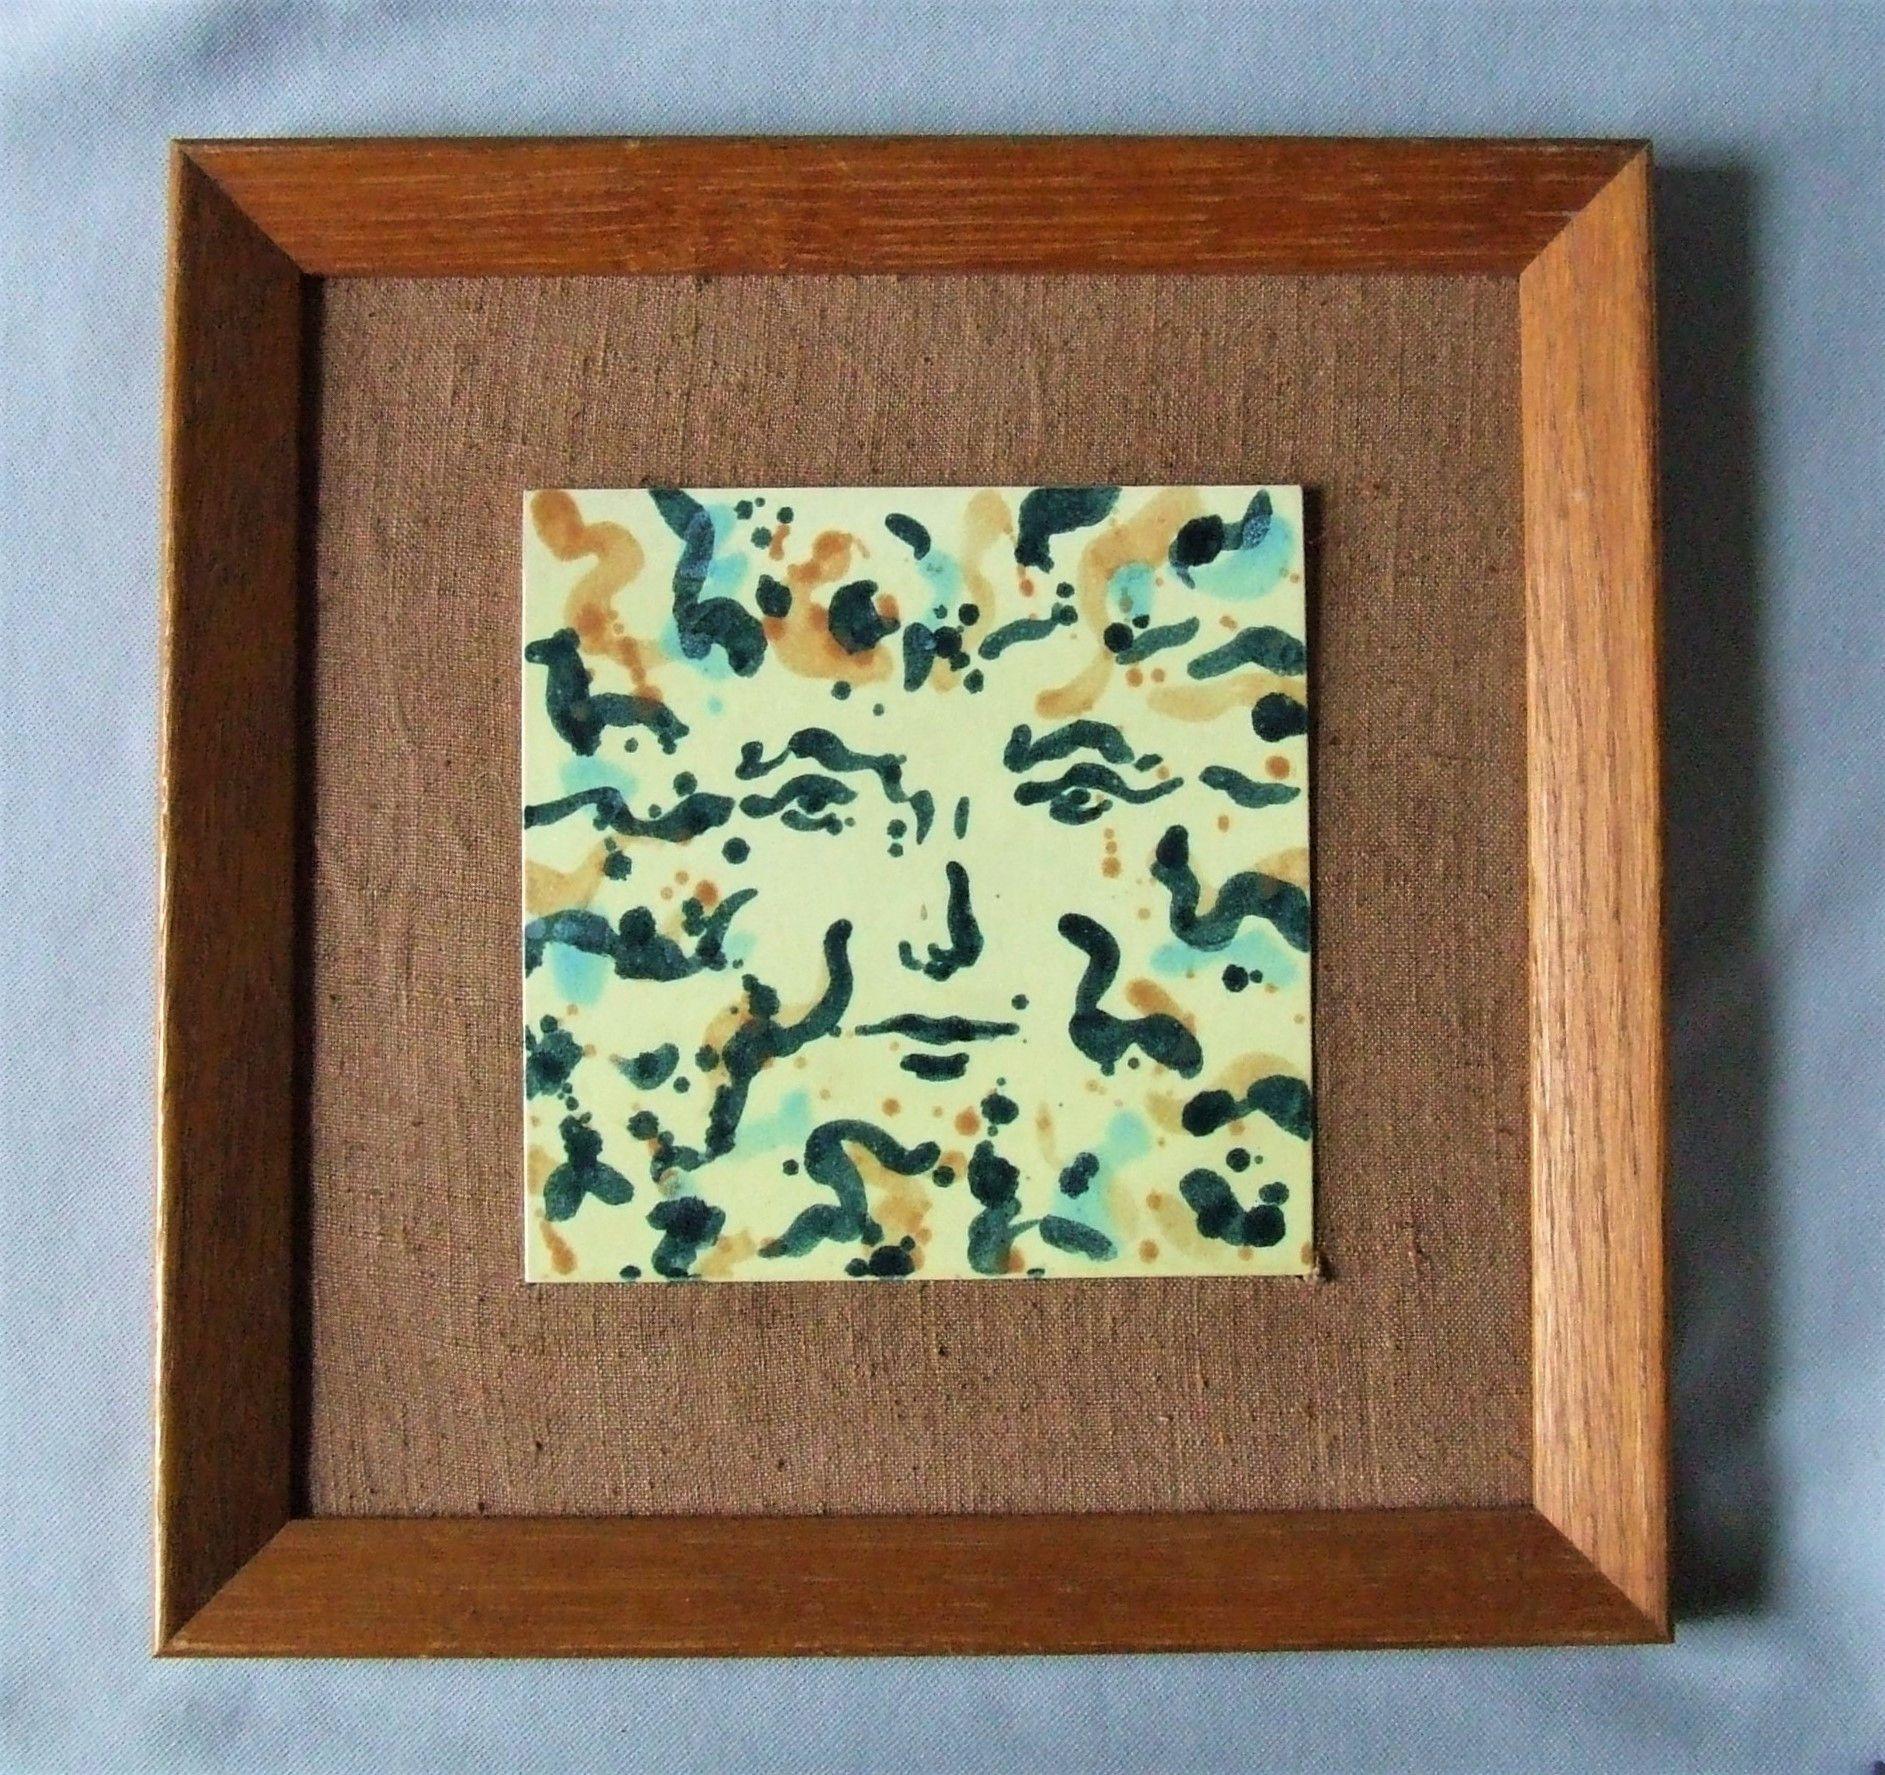 Early Harris Strong Ceramic Tile Hidden Face Framed In Blonde Oak